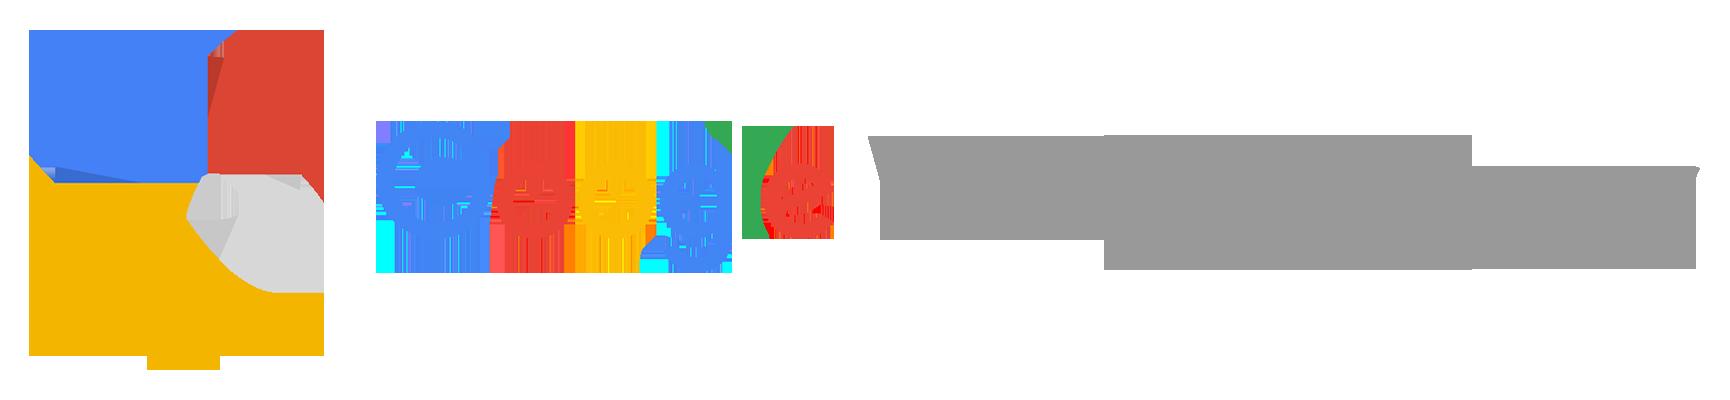 corso web designer wordpress